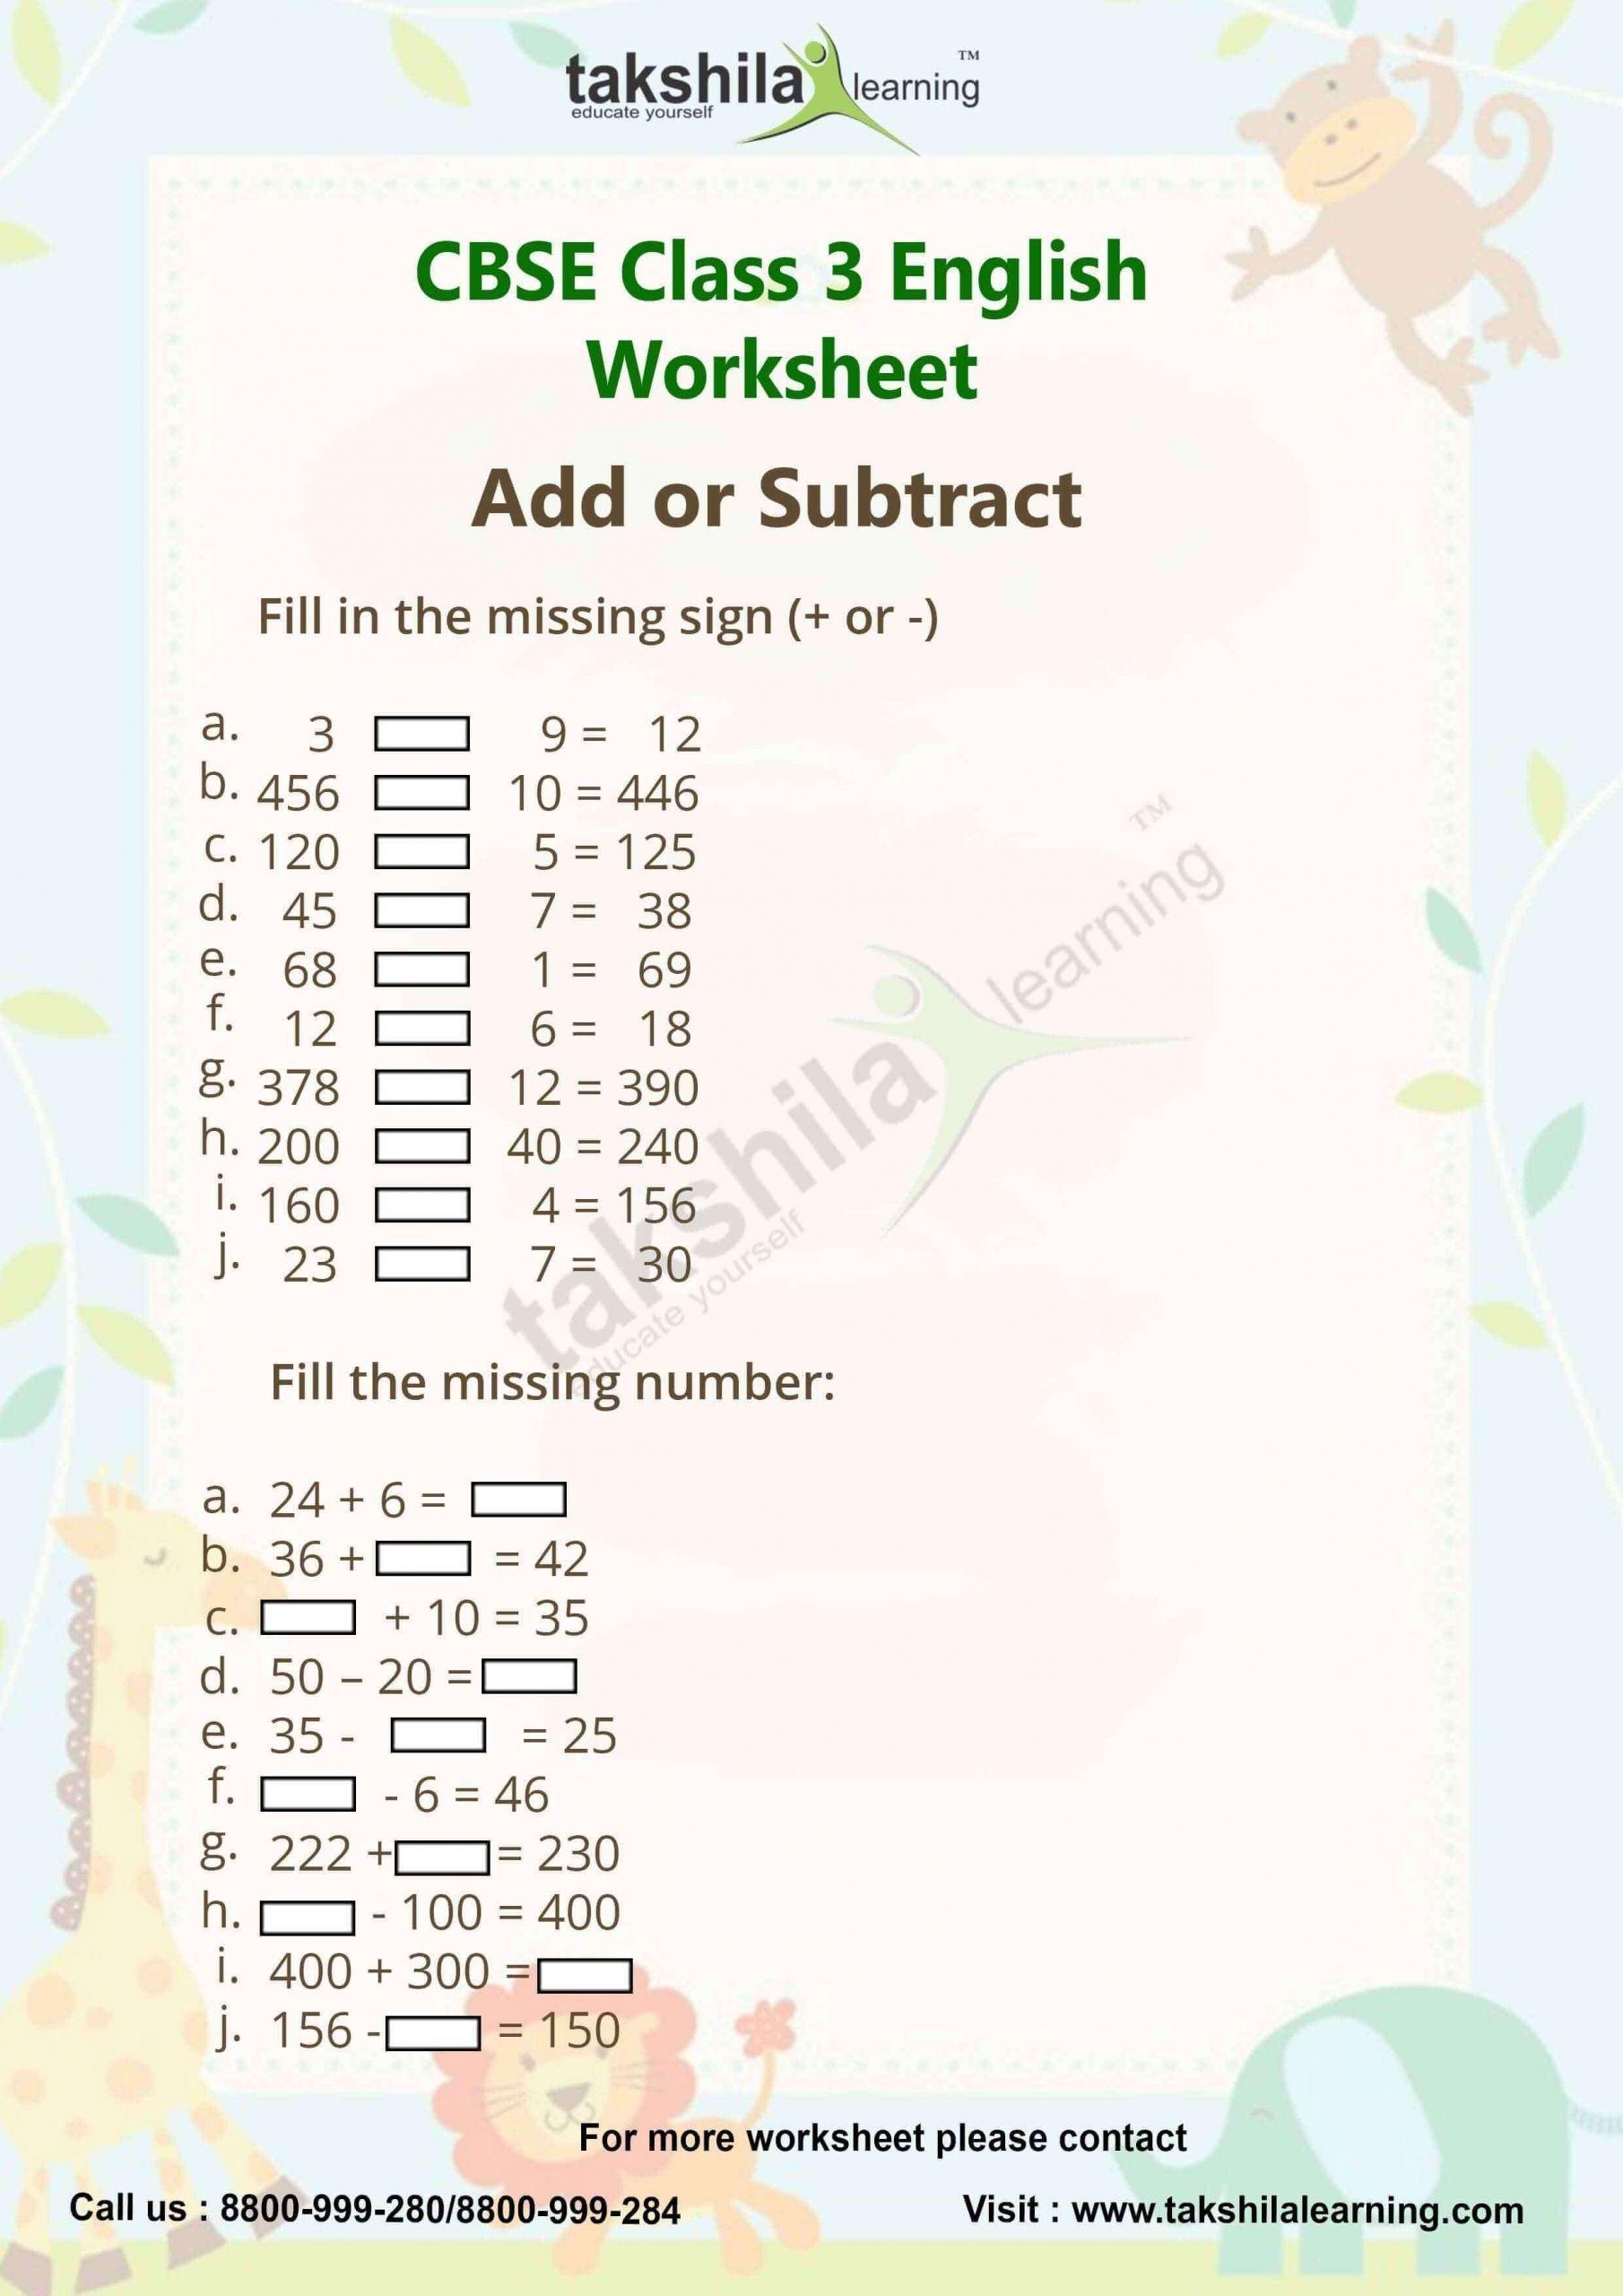 hight resolution of 5 Free Math Worksheets Third Grade 3 Subtraction Subtract Borrow Across 2  Zeros fun wri…   Free math worksheets